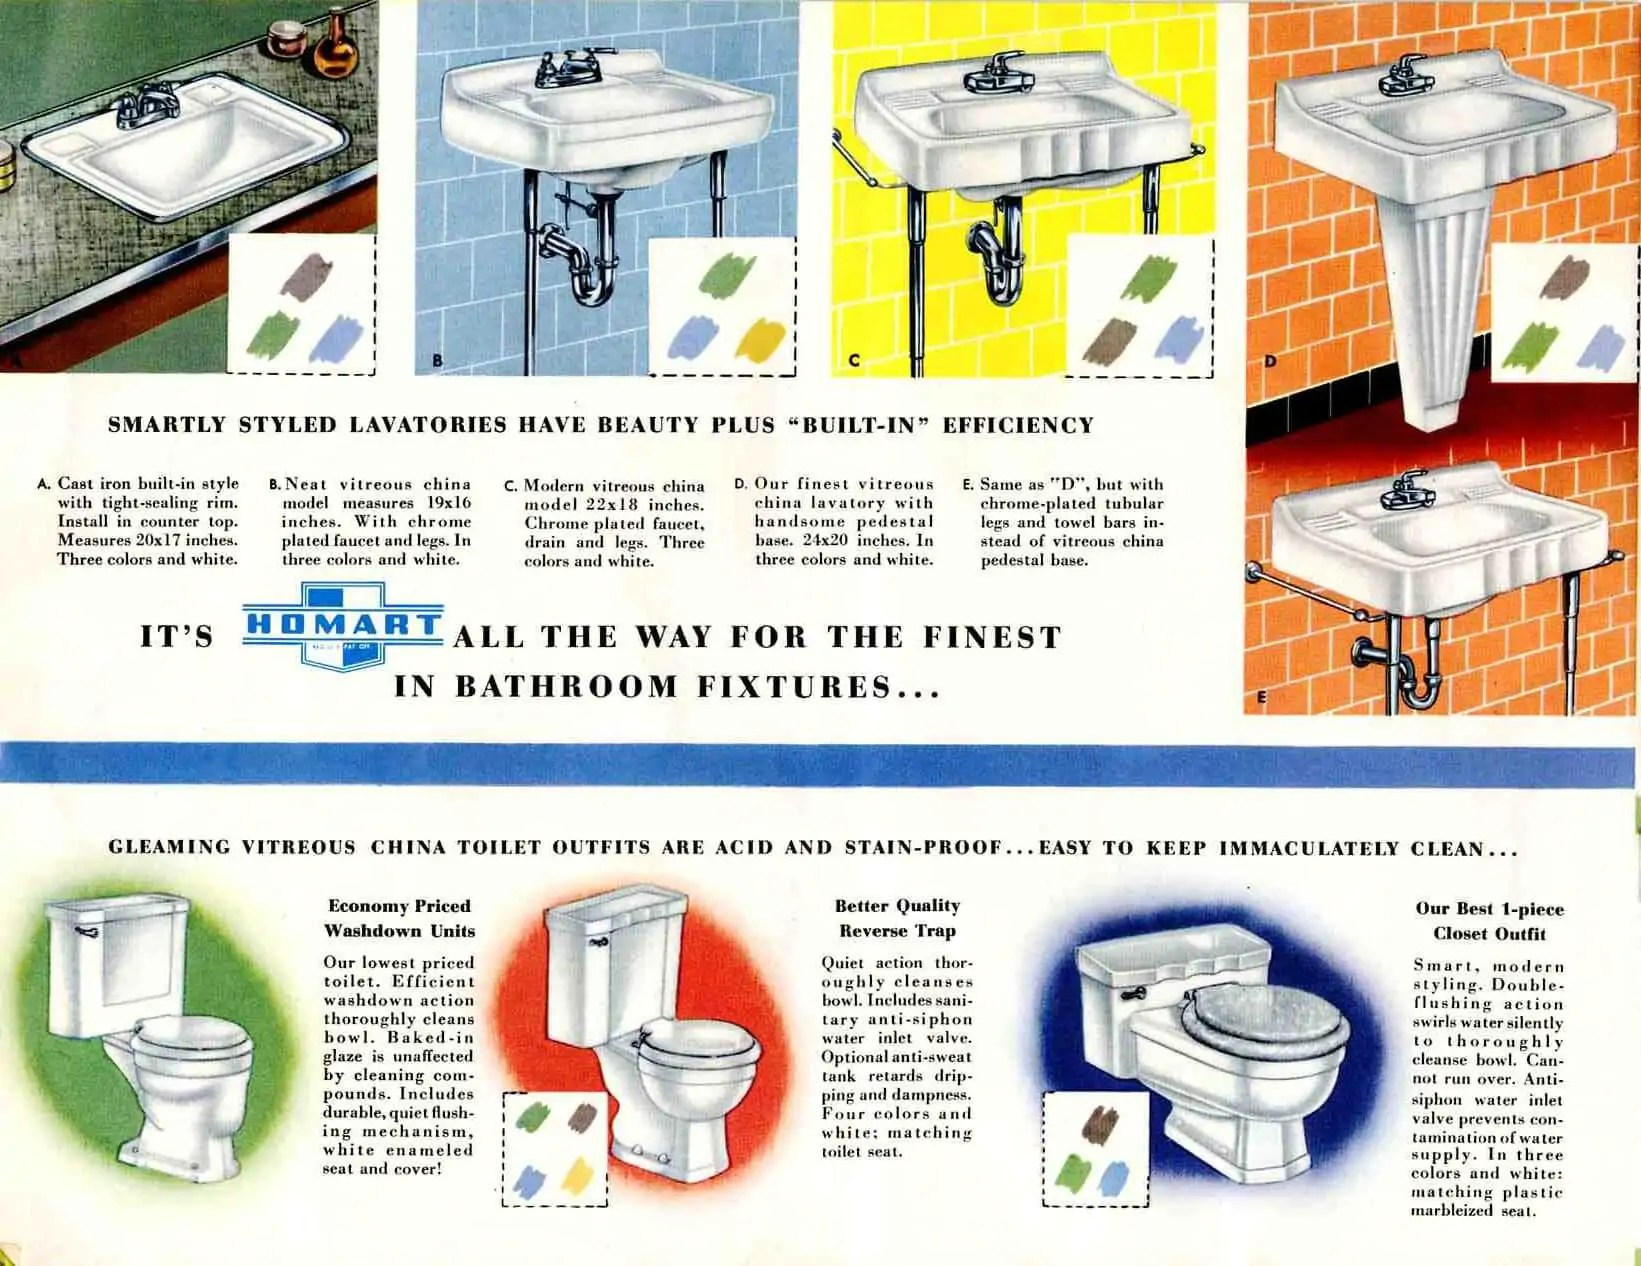 retro bathroom sinks toilets and a